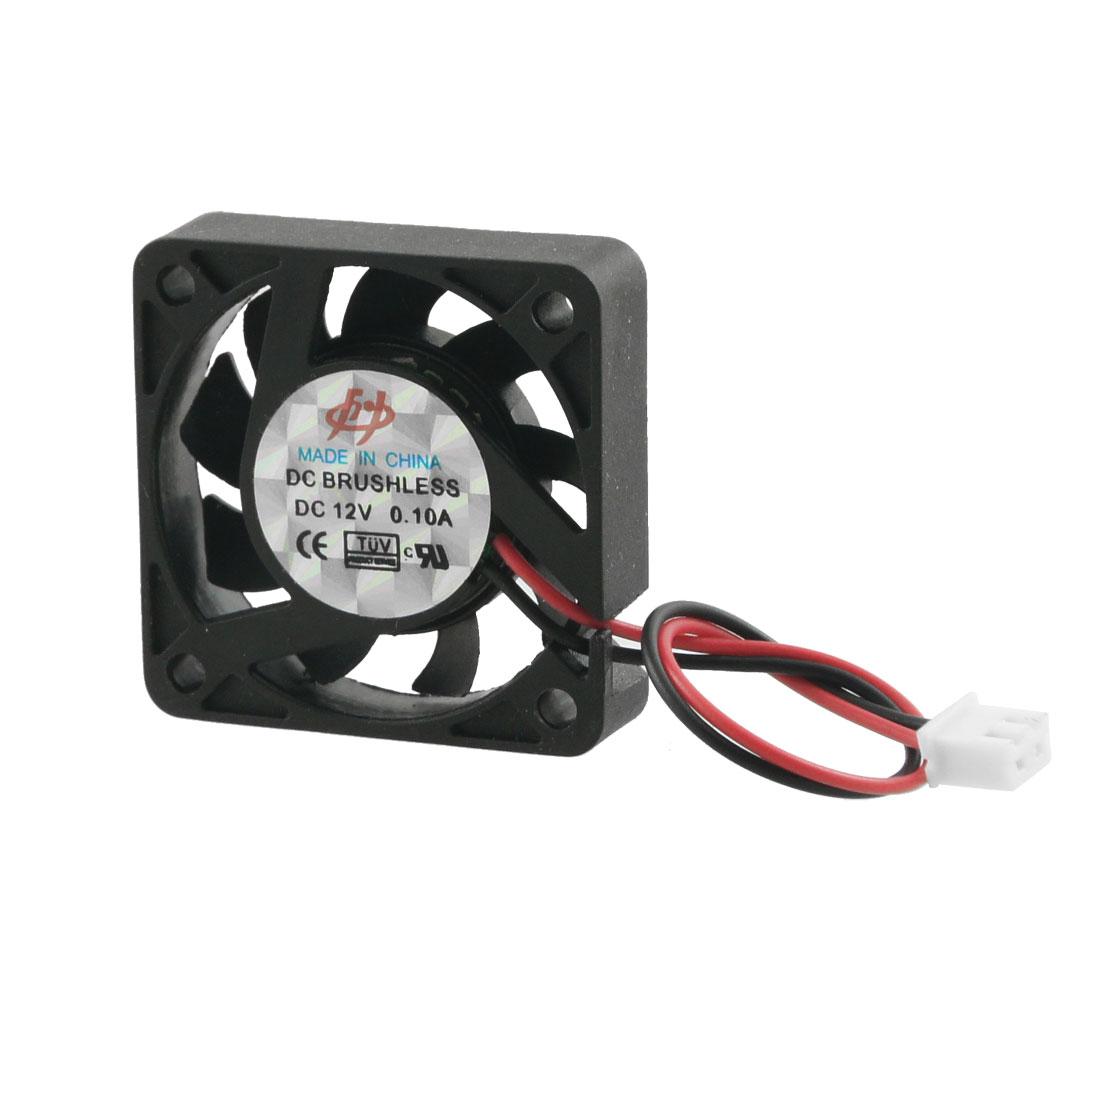 PC Computer DC 12V 0.1A 2 Terminals Connector Black Plastic Cooling Fan